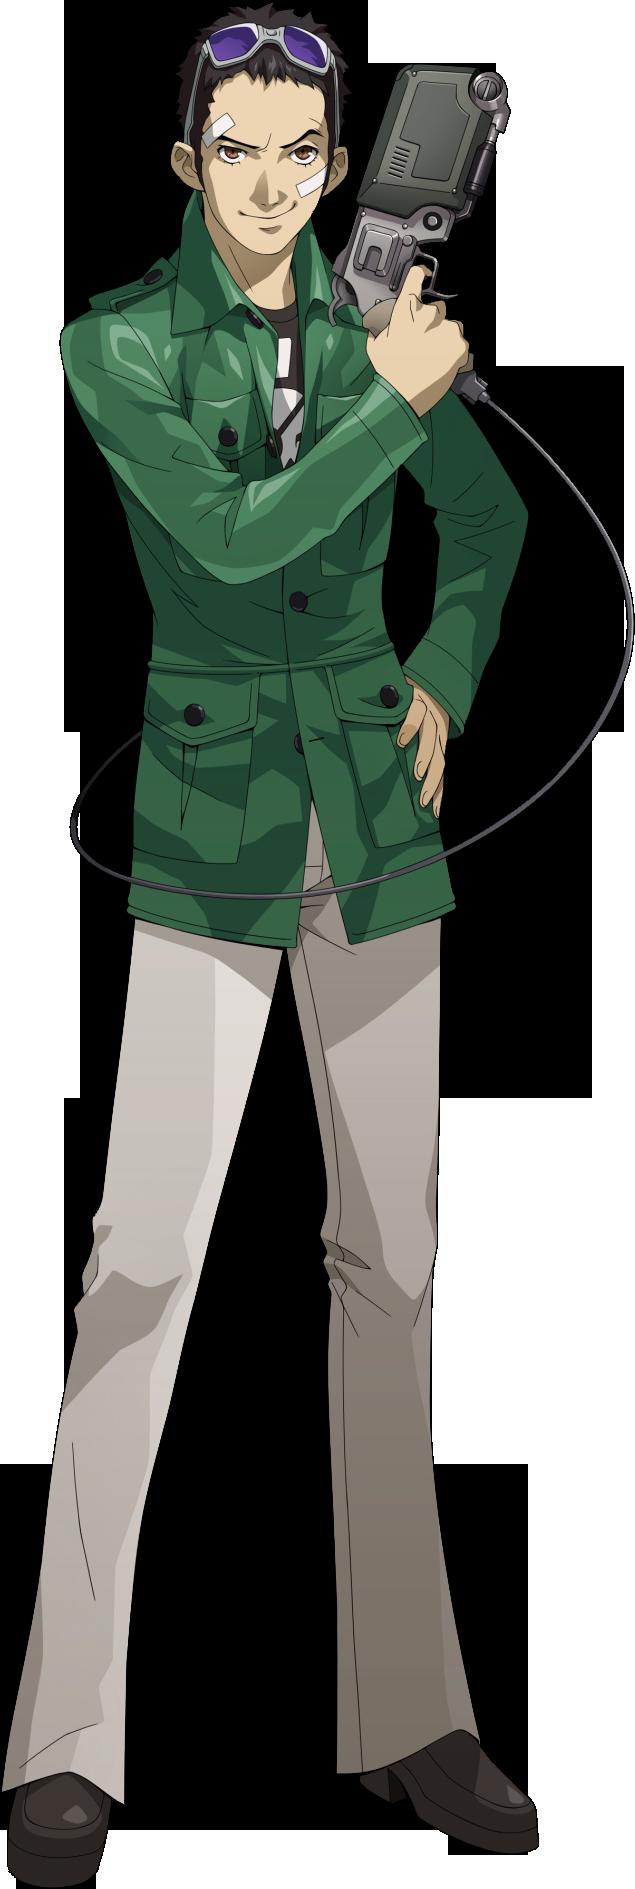 Keiji Minegishi